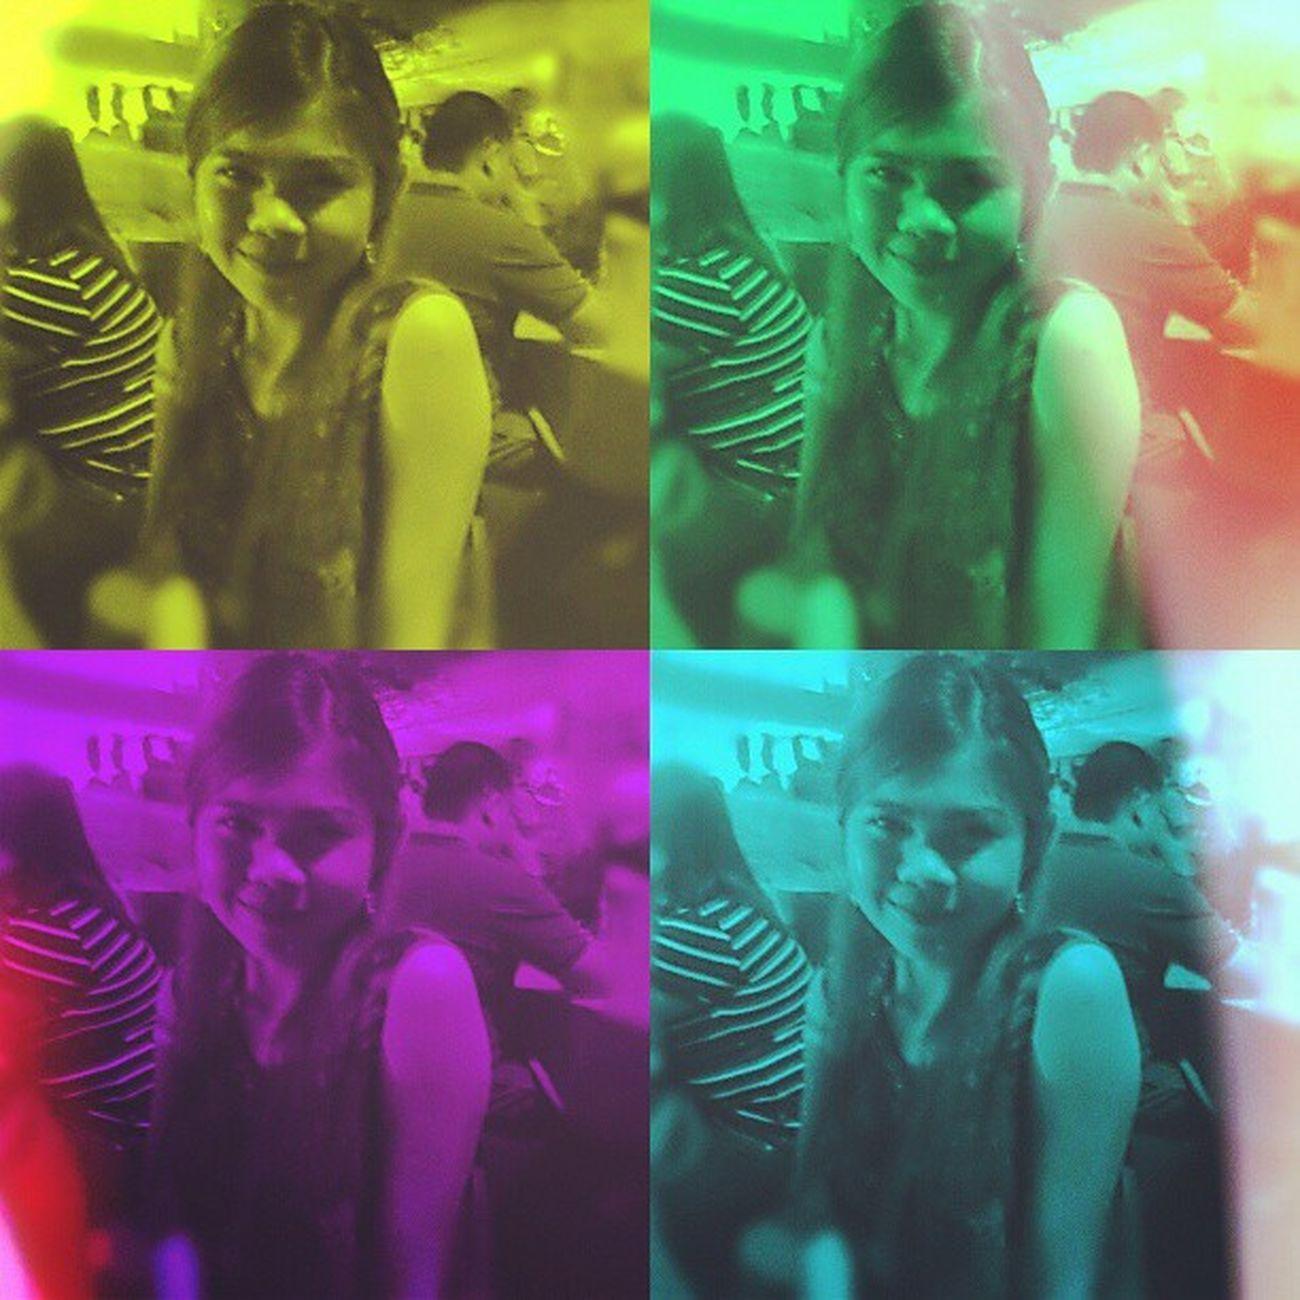 At rampada street party... Igers Igpose Igcapture Igshot Instagram Instacapture Instapose Party Followme Followback Saturday Loveit Happy